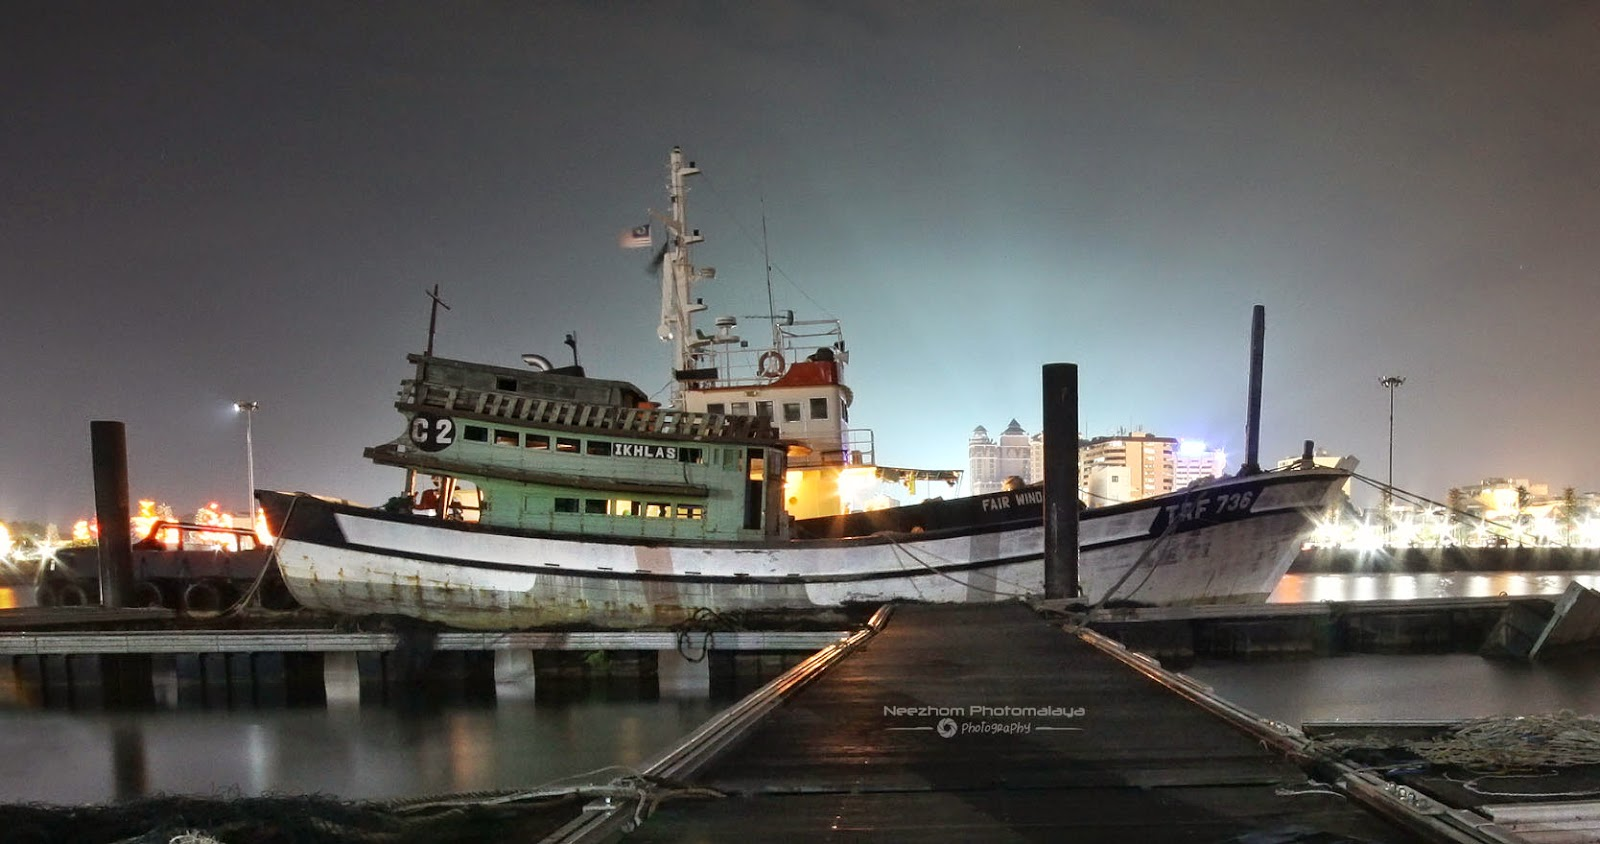 Jeti di Pulau Duyong waktu malam